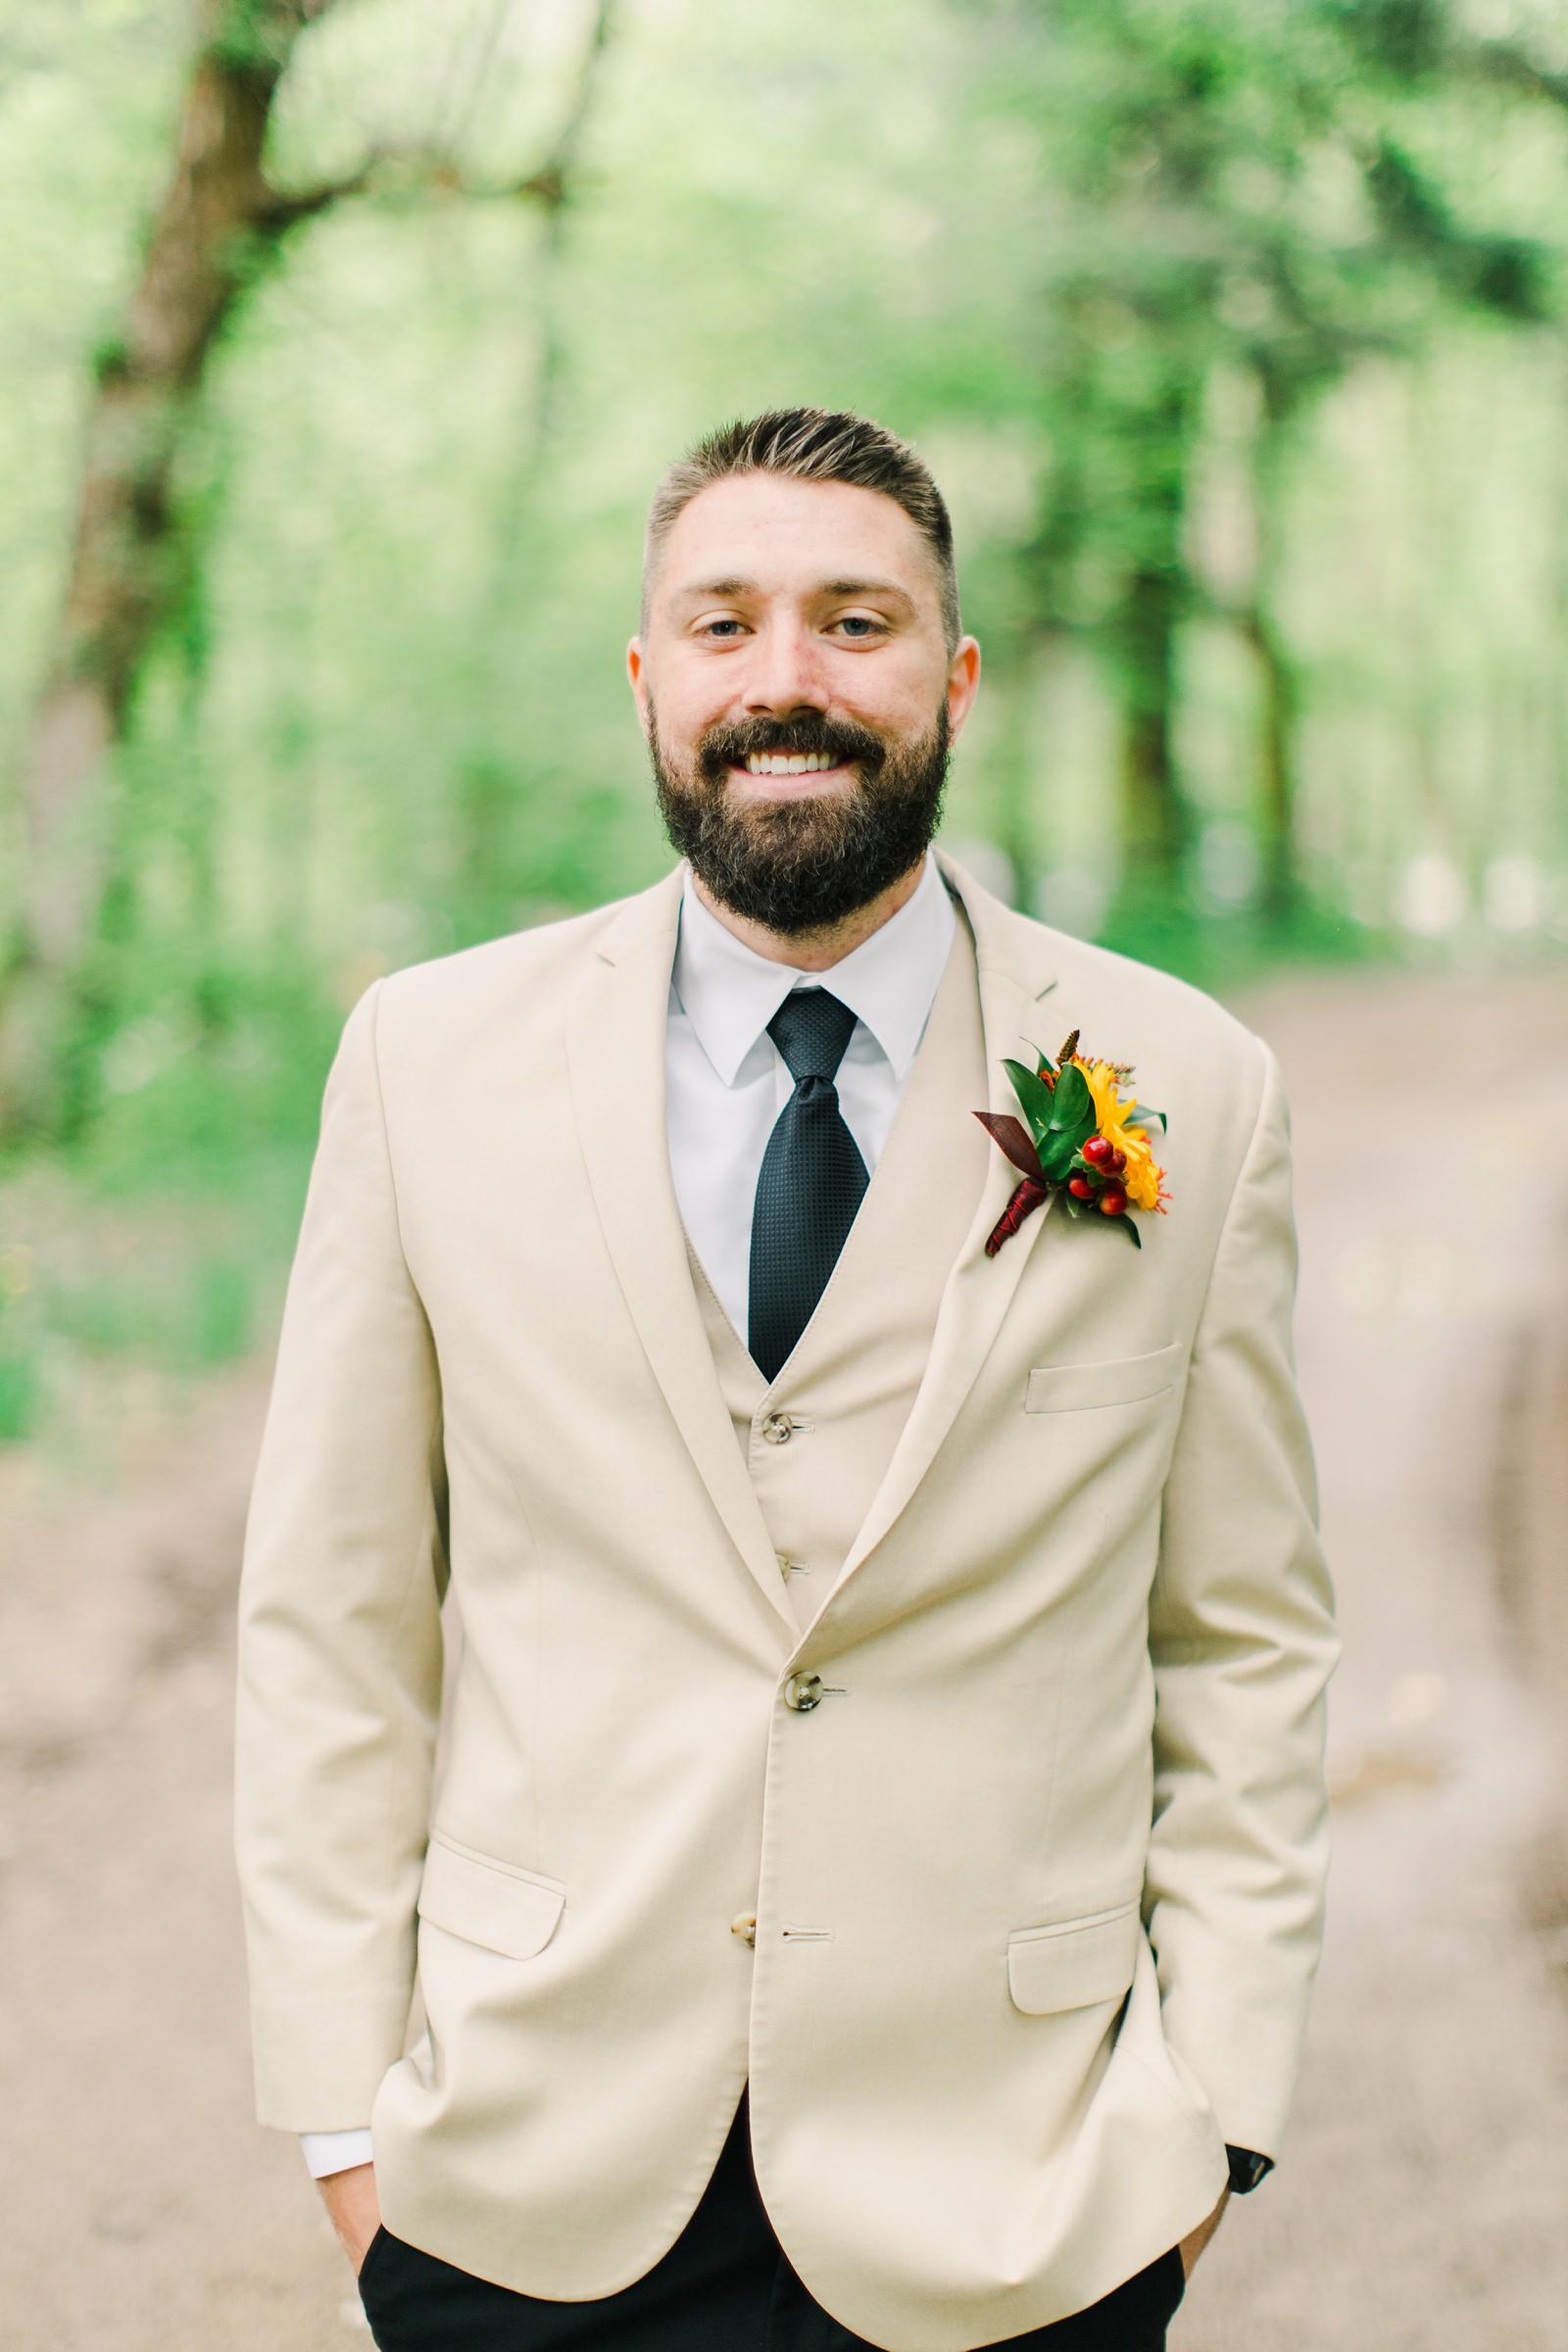 Millcreek Inn Summer Wedding, Utah wedding photography Millcreek Canyon, Salt Lake City, groom in suit with tan jacket and black pants, navy tie,